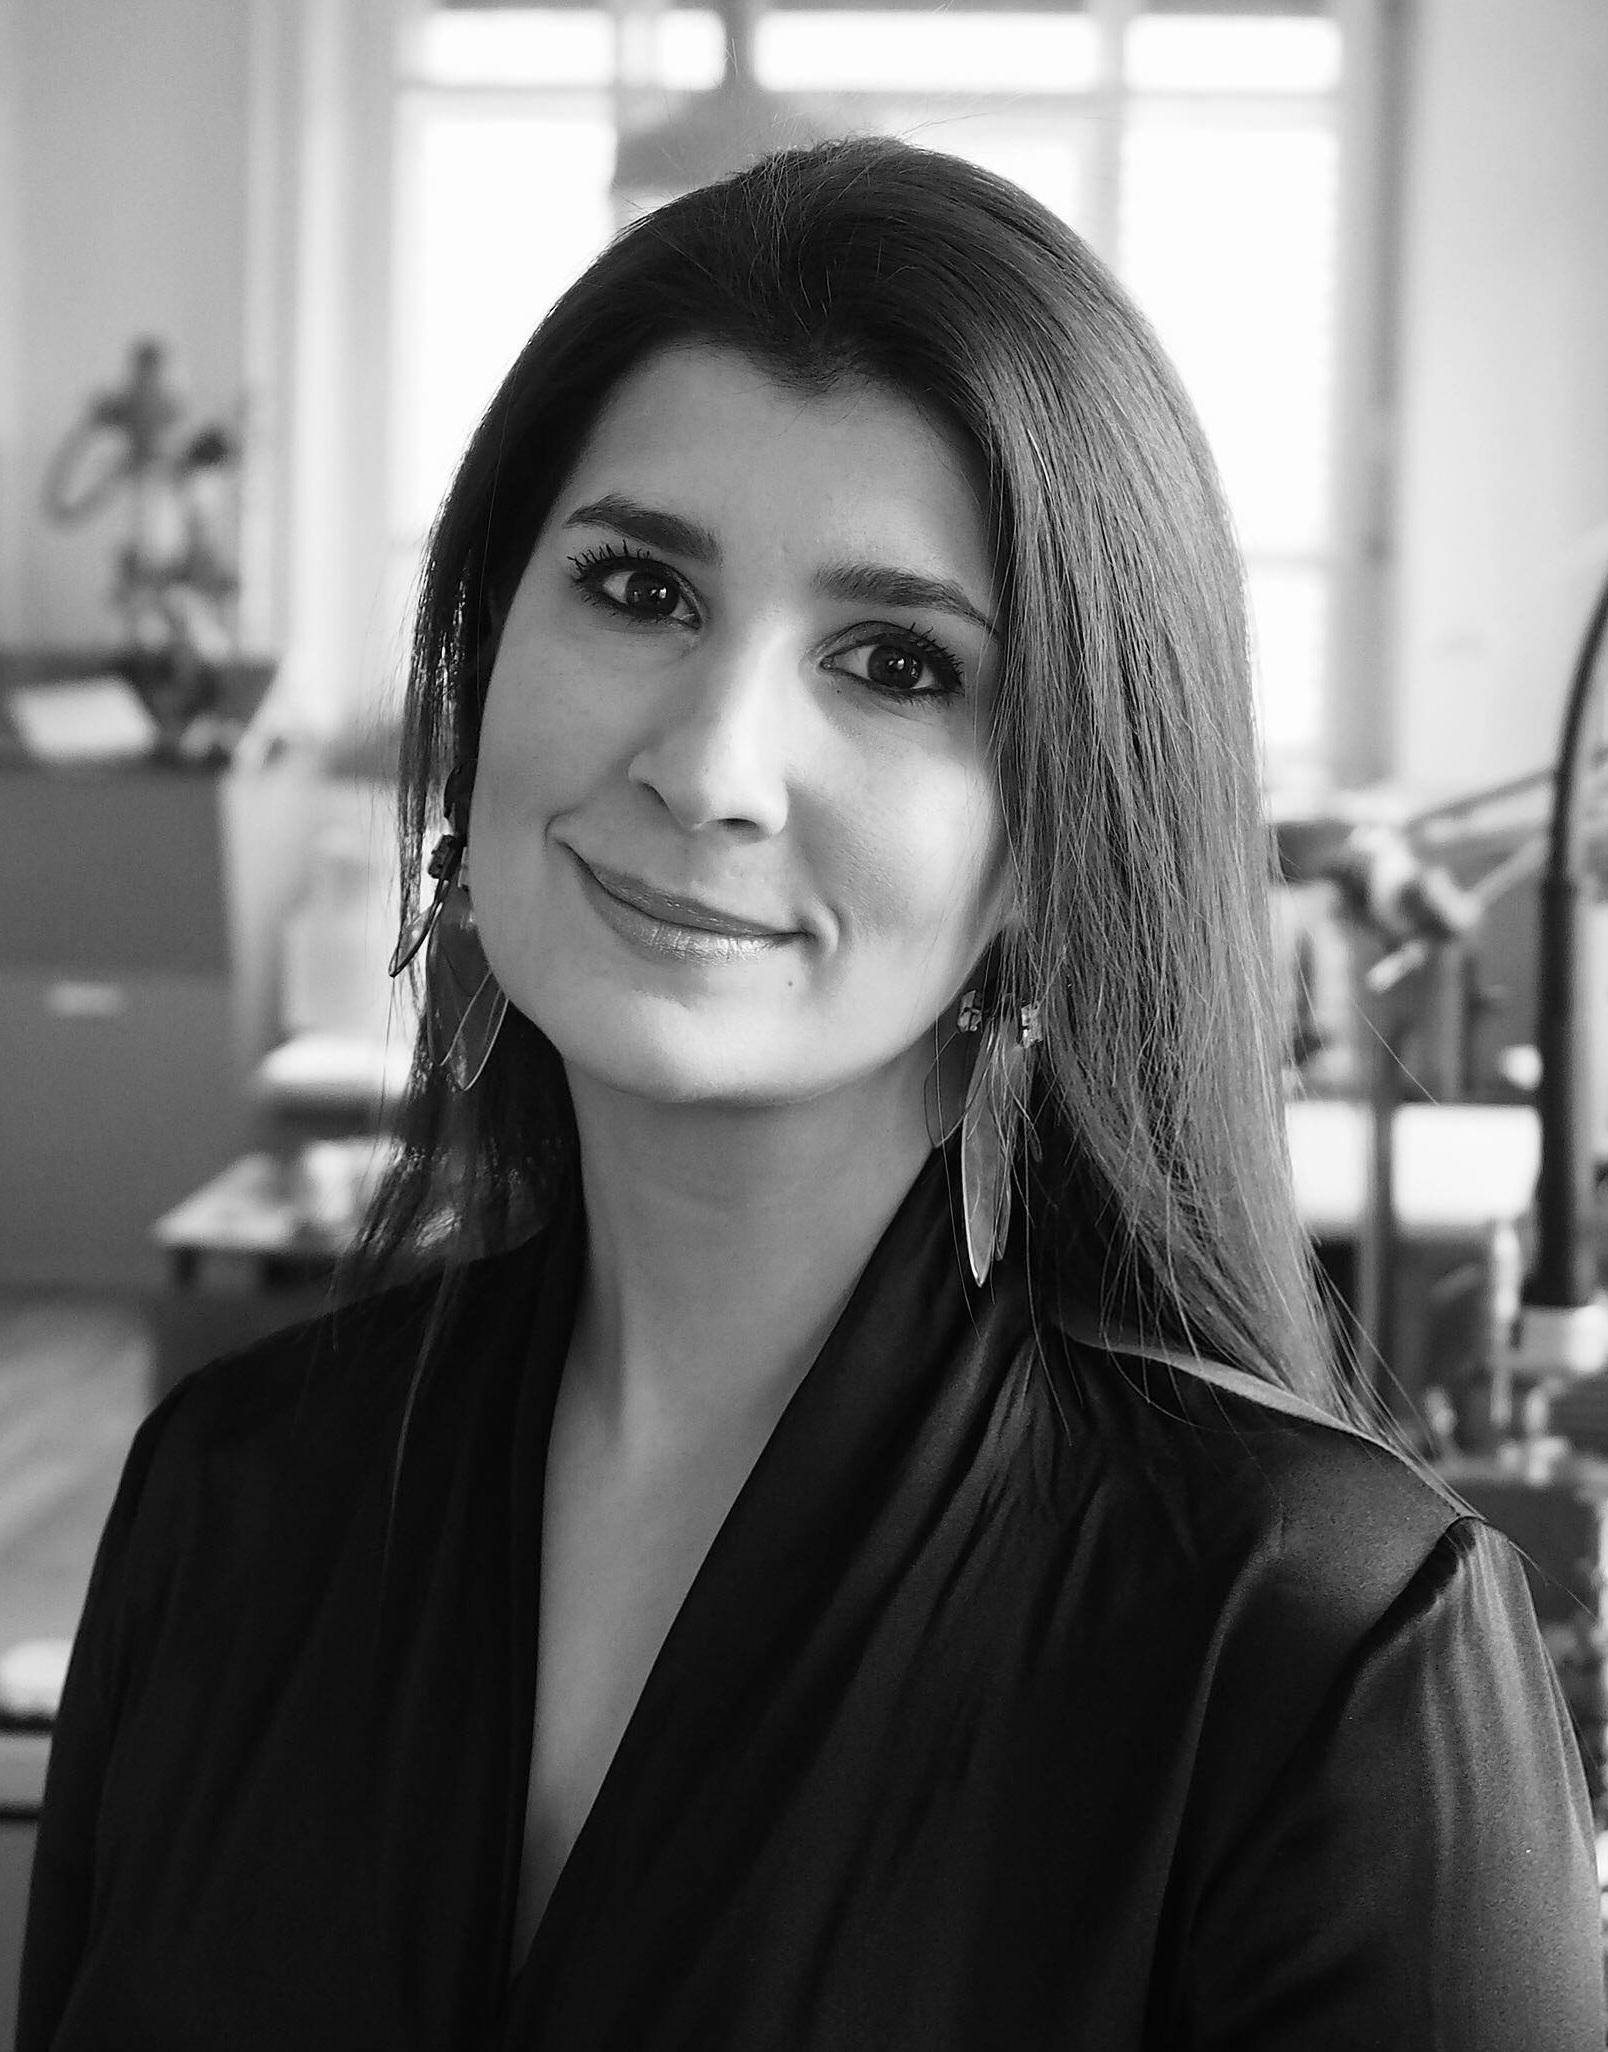 Nathalie Marielloni (Curator)